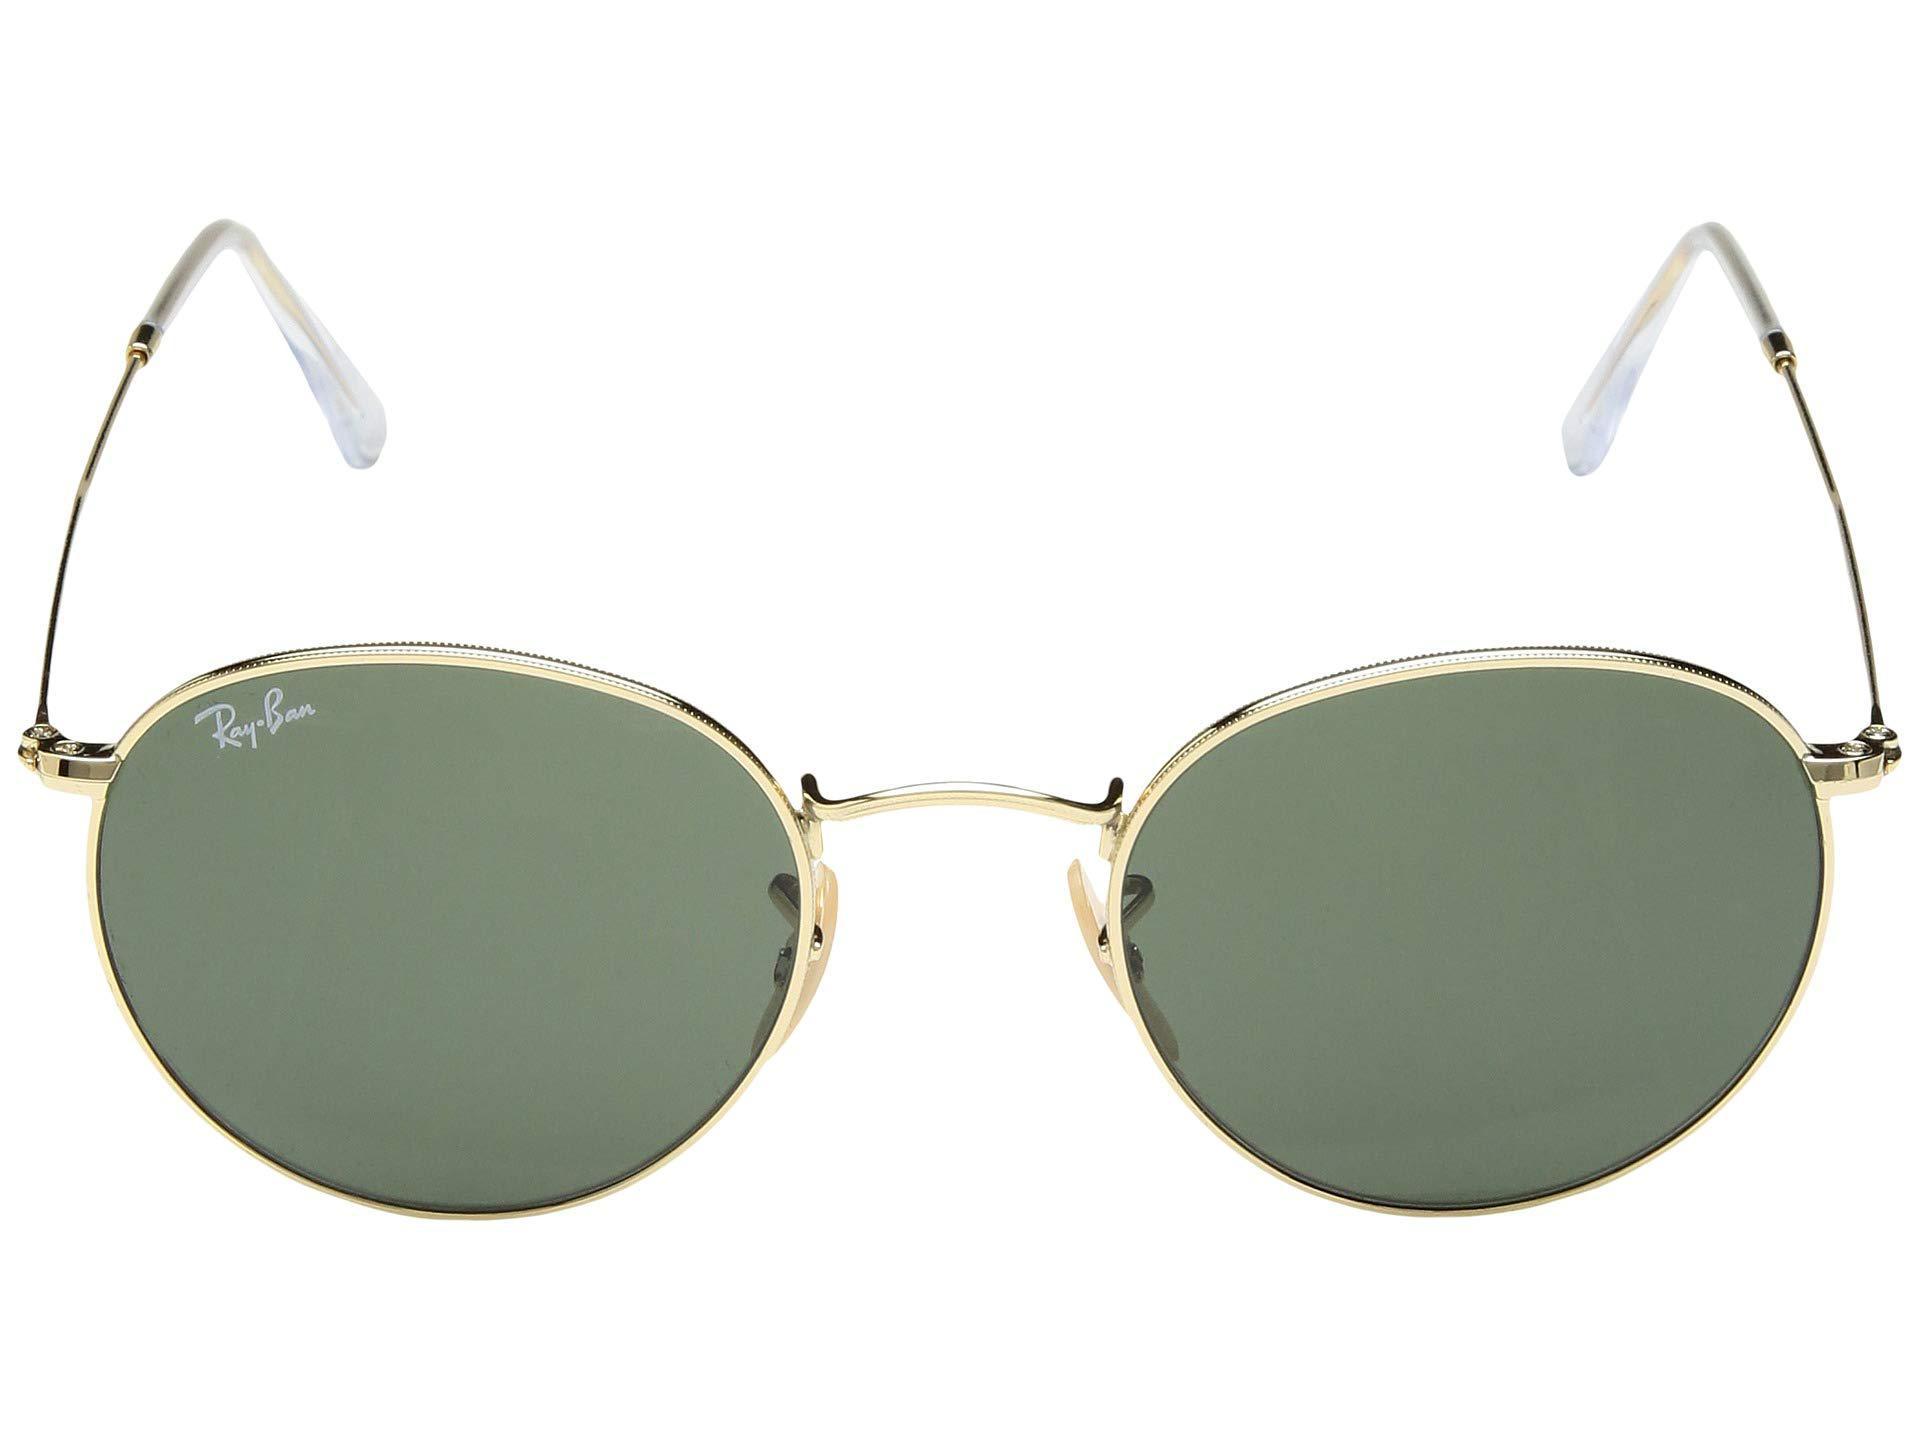 5b392778bc Ray-Ban - Multicolor 0rb3447 Round Metal 50mm (gold green) Fashion  Sunglasses. View fullscreen